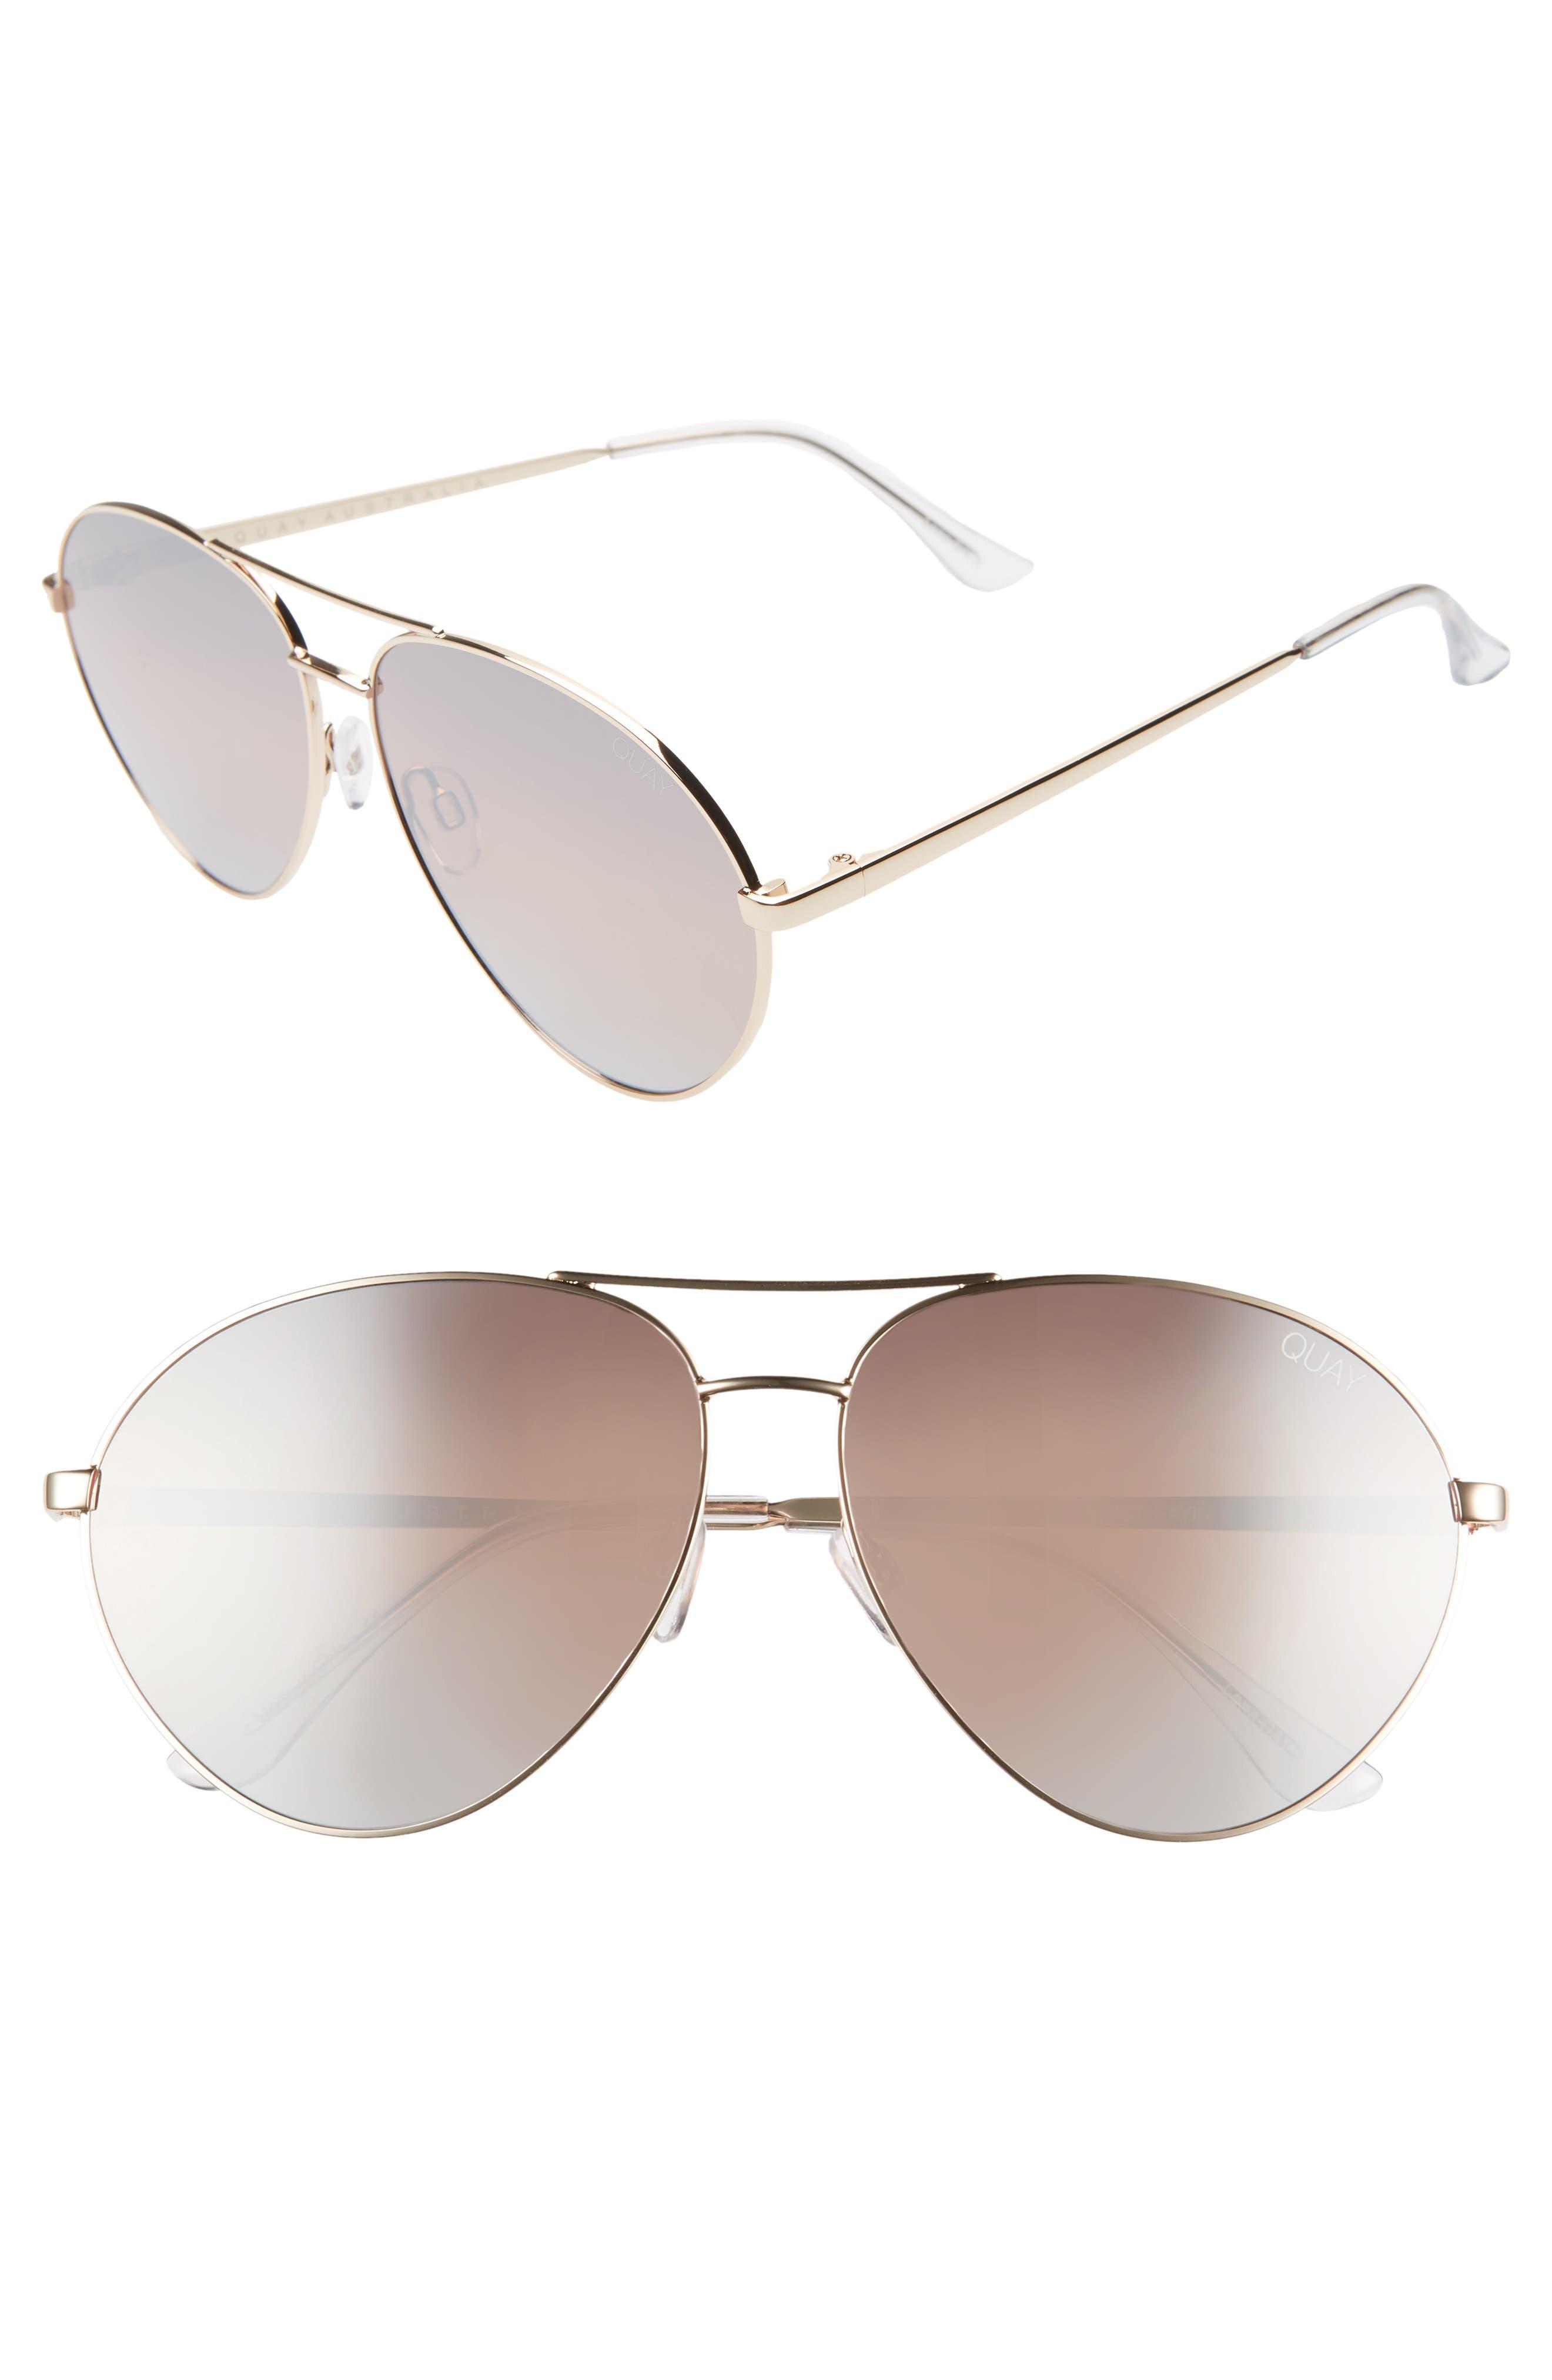 Quay Australia Just Sayin 5m Aviator Sunglasses - Gold/ Brown